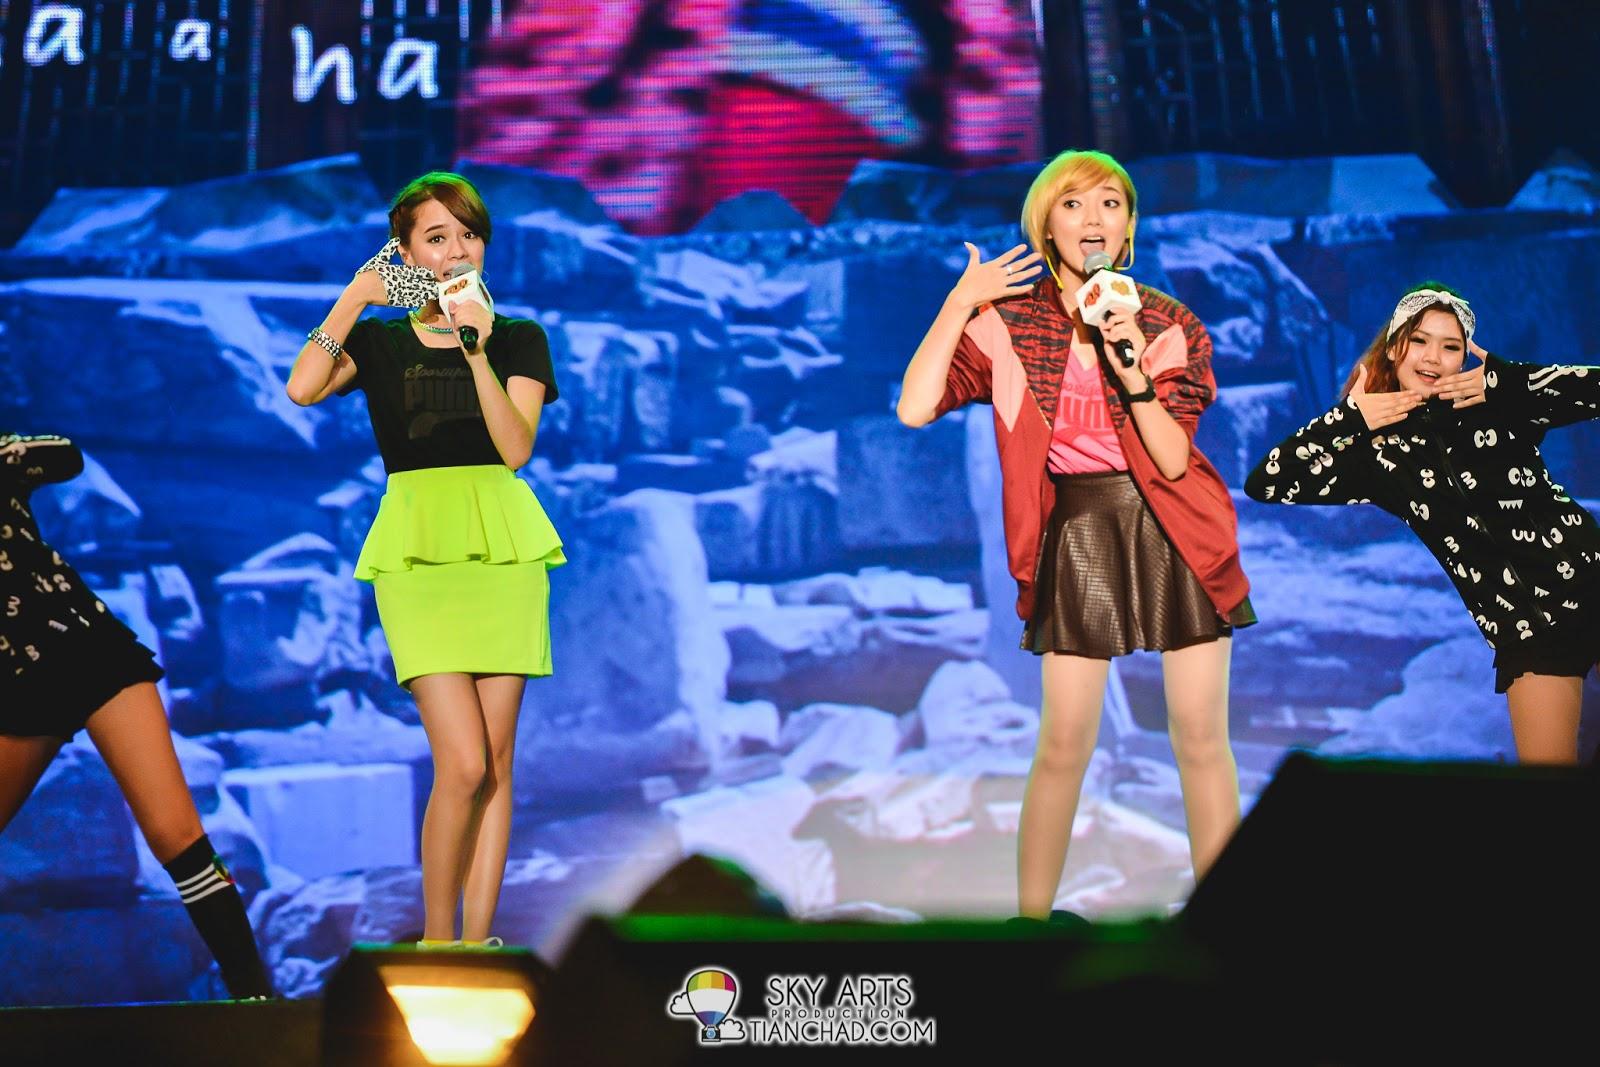 Fyone陈慧莹 & Stephanie刘佩芯 - Jo-A-Hae *表演不错,不过vocal要再加强些*